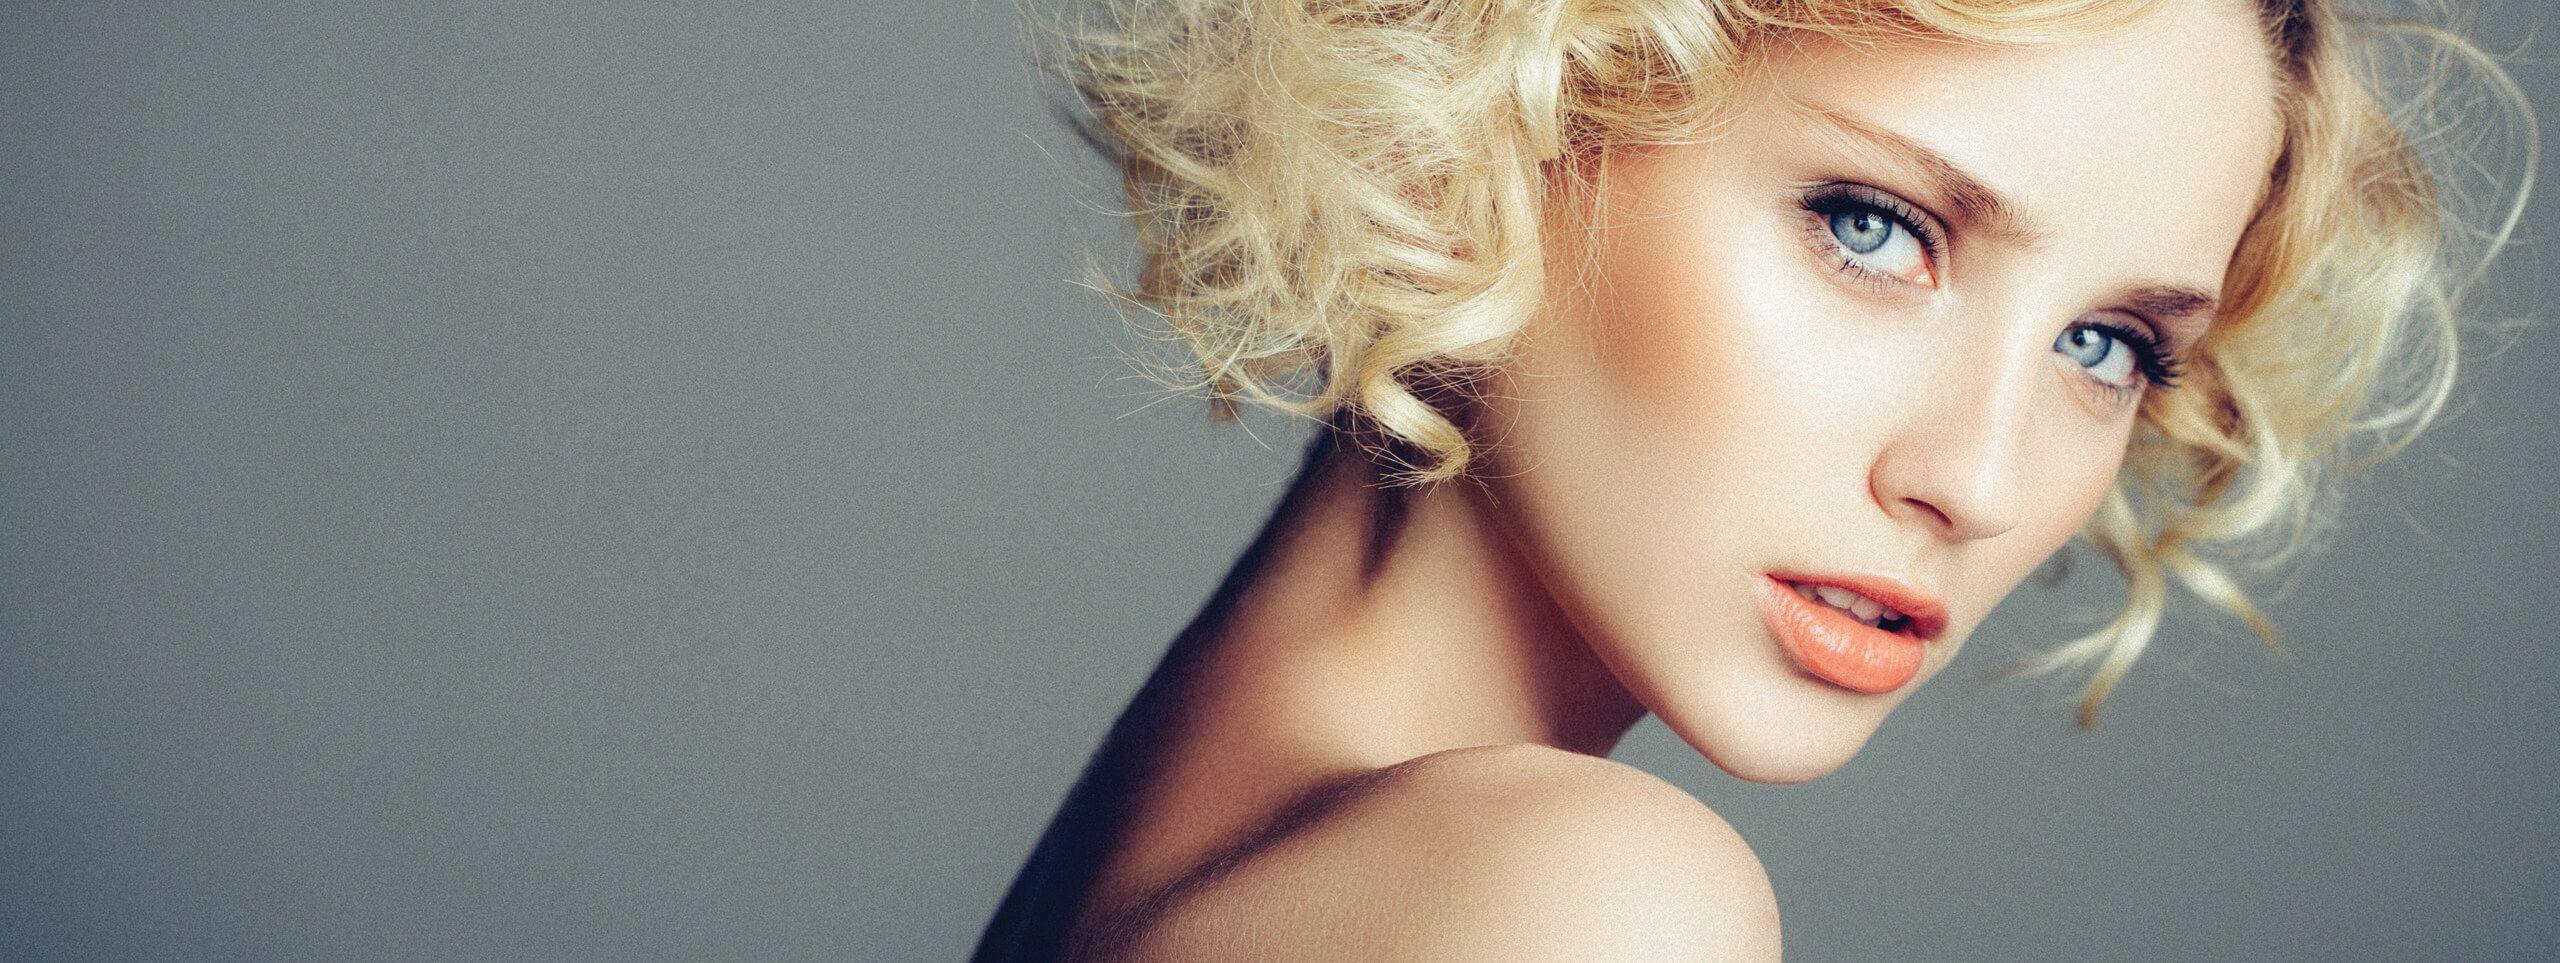 Model wears blonde hair in soft wavy hairstyle